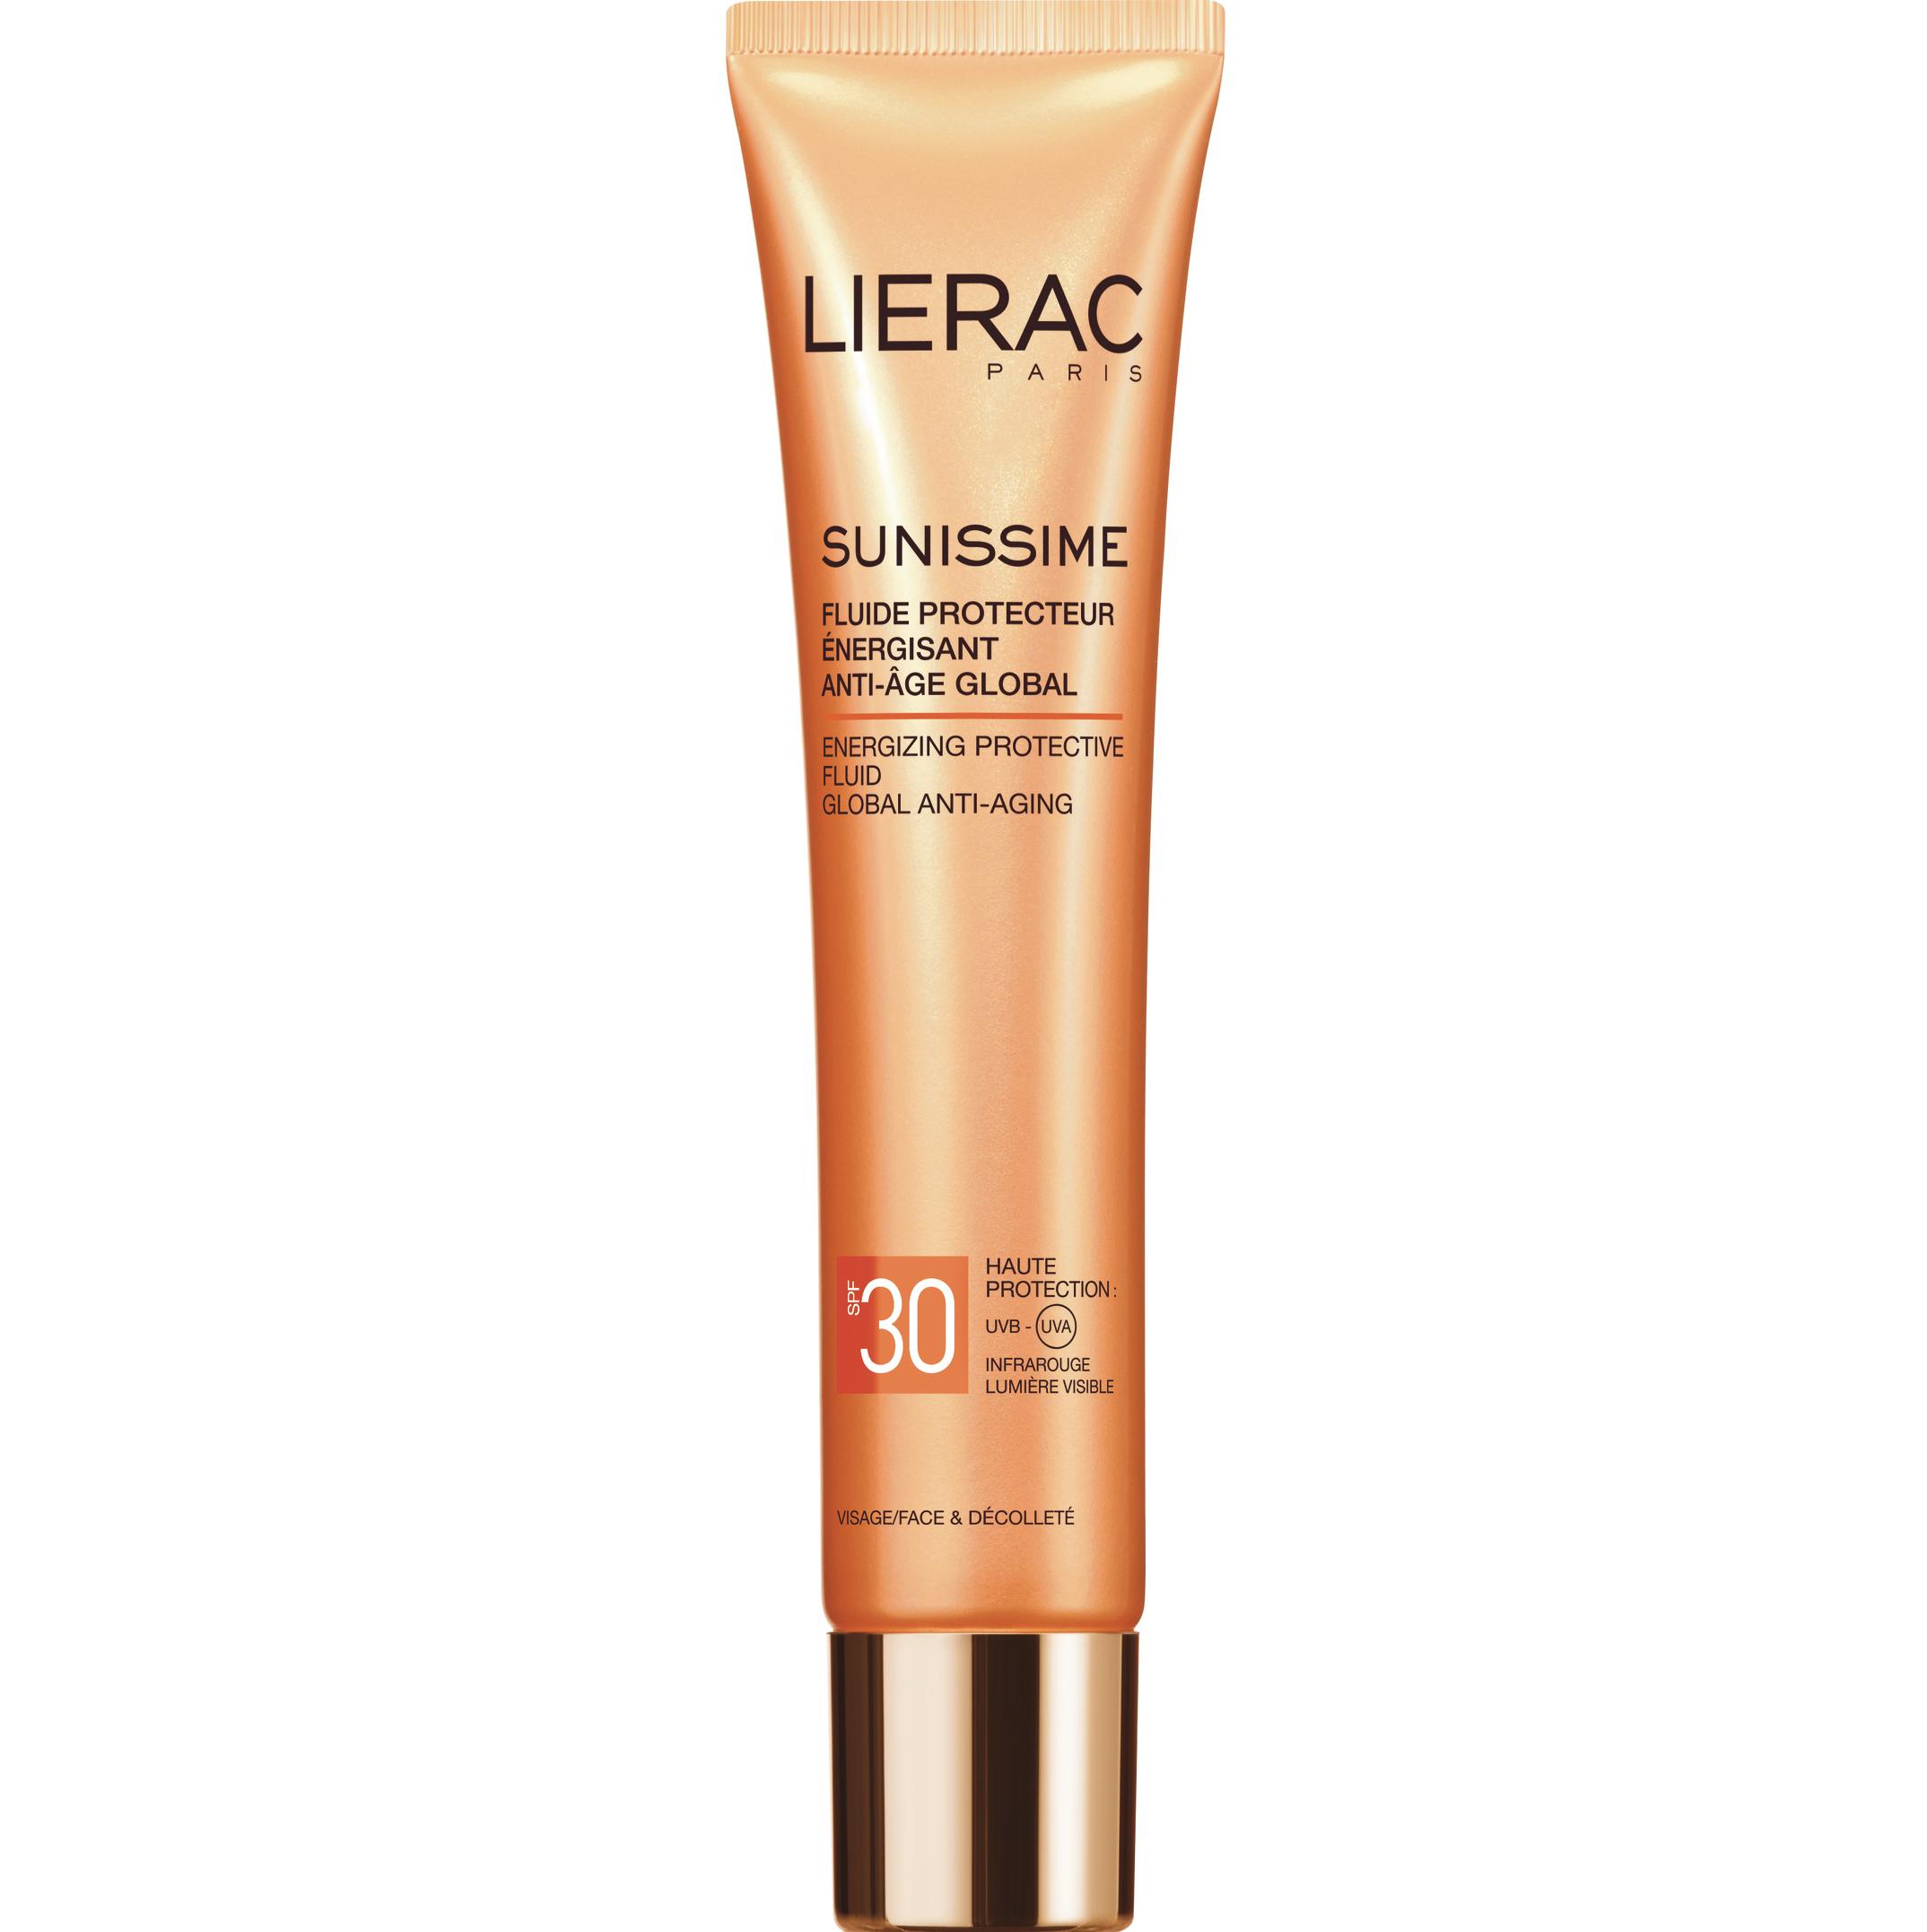 Lierac Sunissime Fluide Protecteur Energisant Anti-âge Global Spf30 Αντηλιακή, Αντιγηραντική Λεπτόρρευστη Κρέμα Προσώπου 40ml